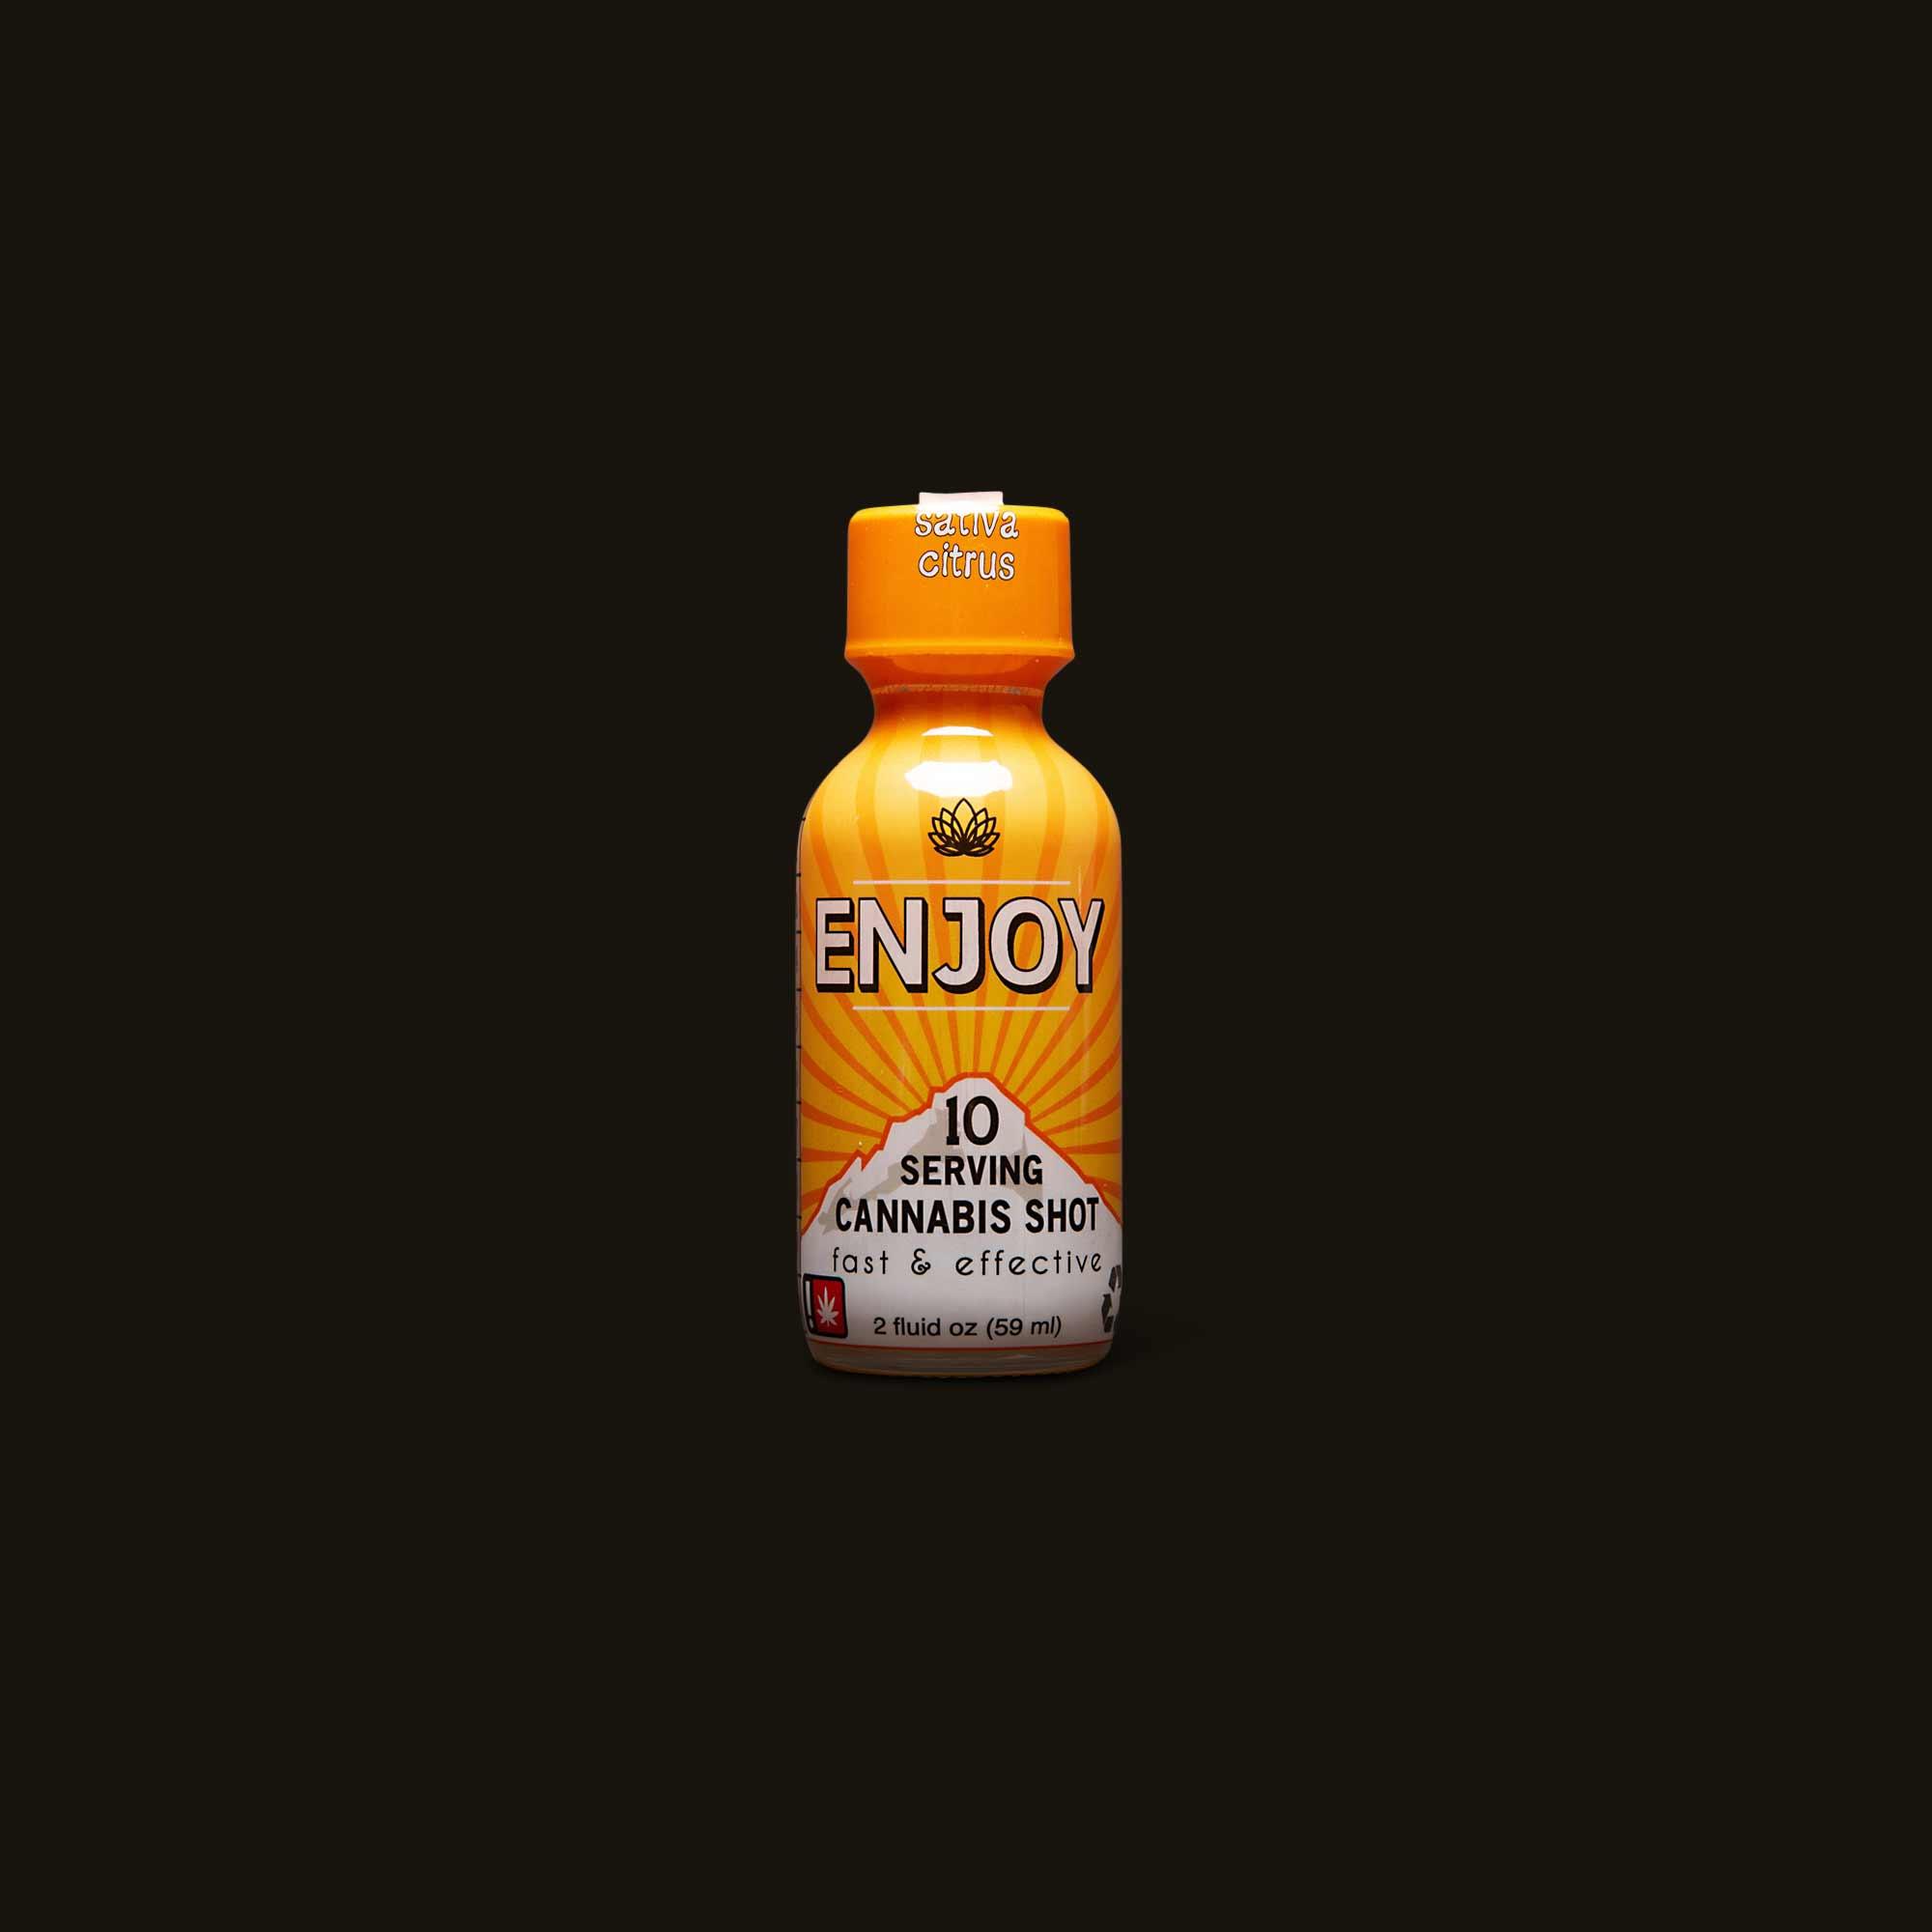 Enjoy Sativa Citrus Shot